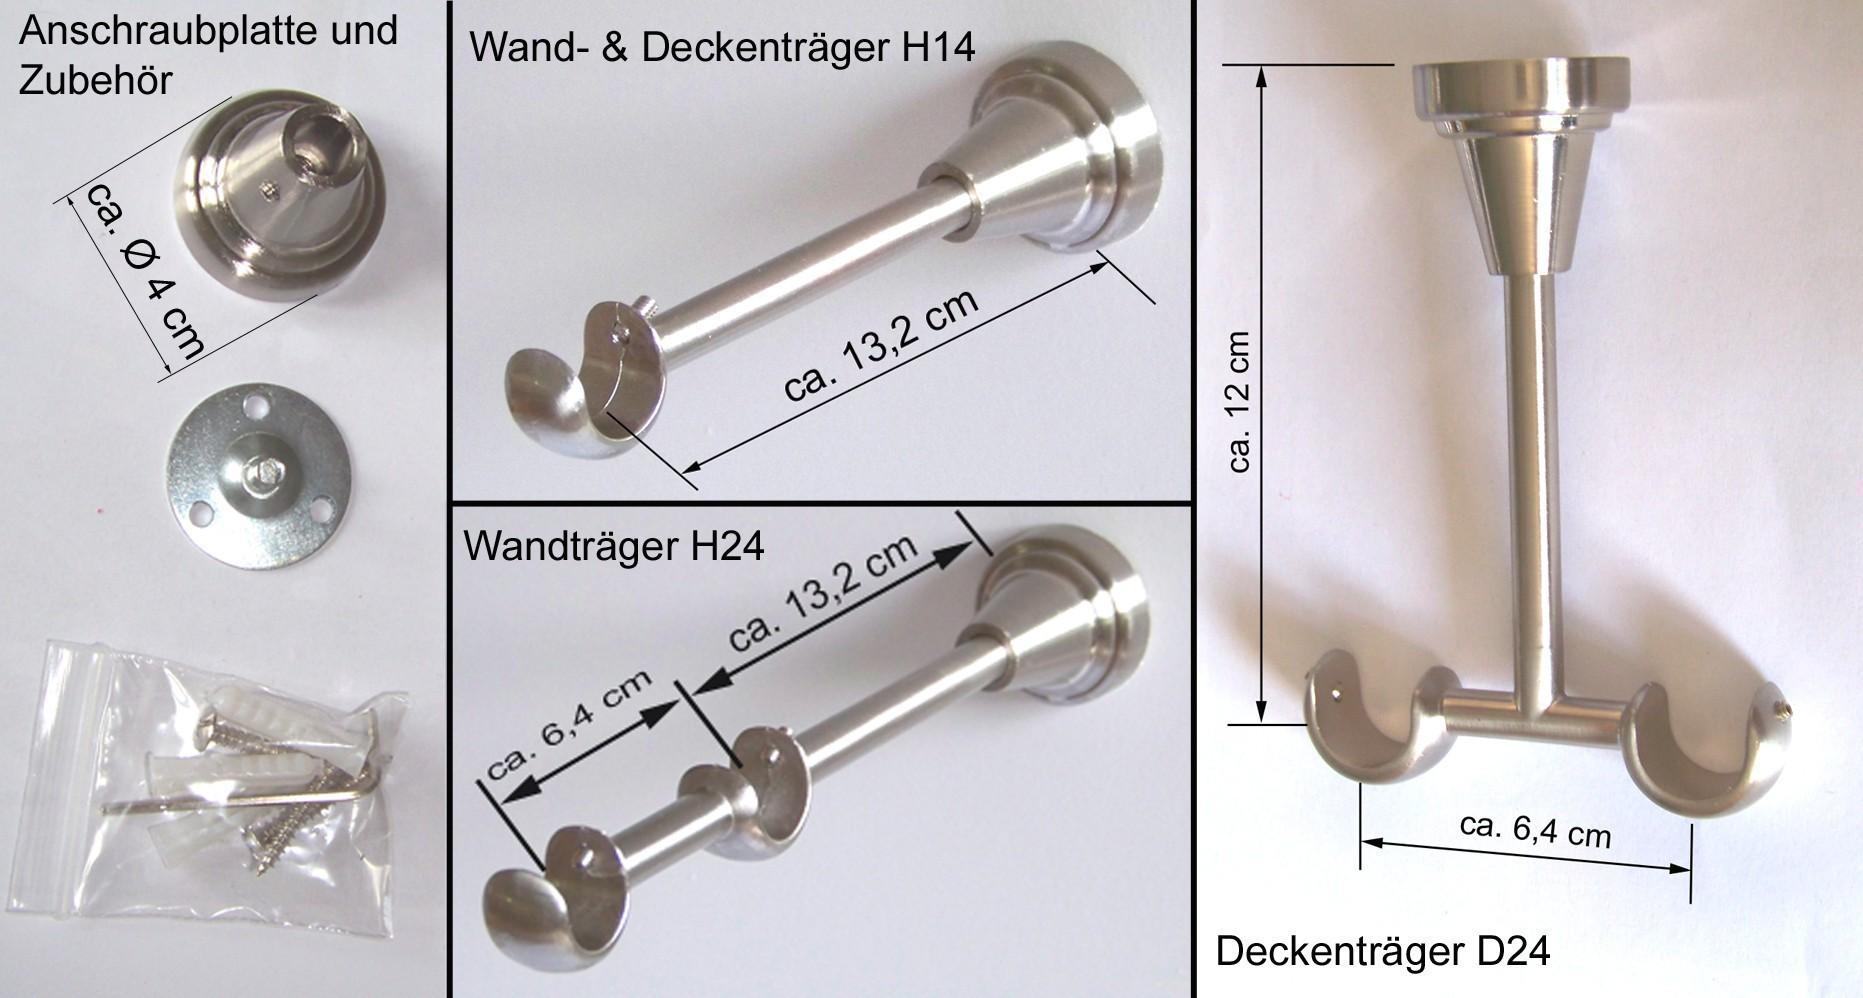 gardinenstange edelstahl look 16mm wand deckentr ger oder zusatzlauf holz e51 gardinenstangen. Black Bedroom Furniture Sets. Home Design Ideas